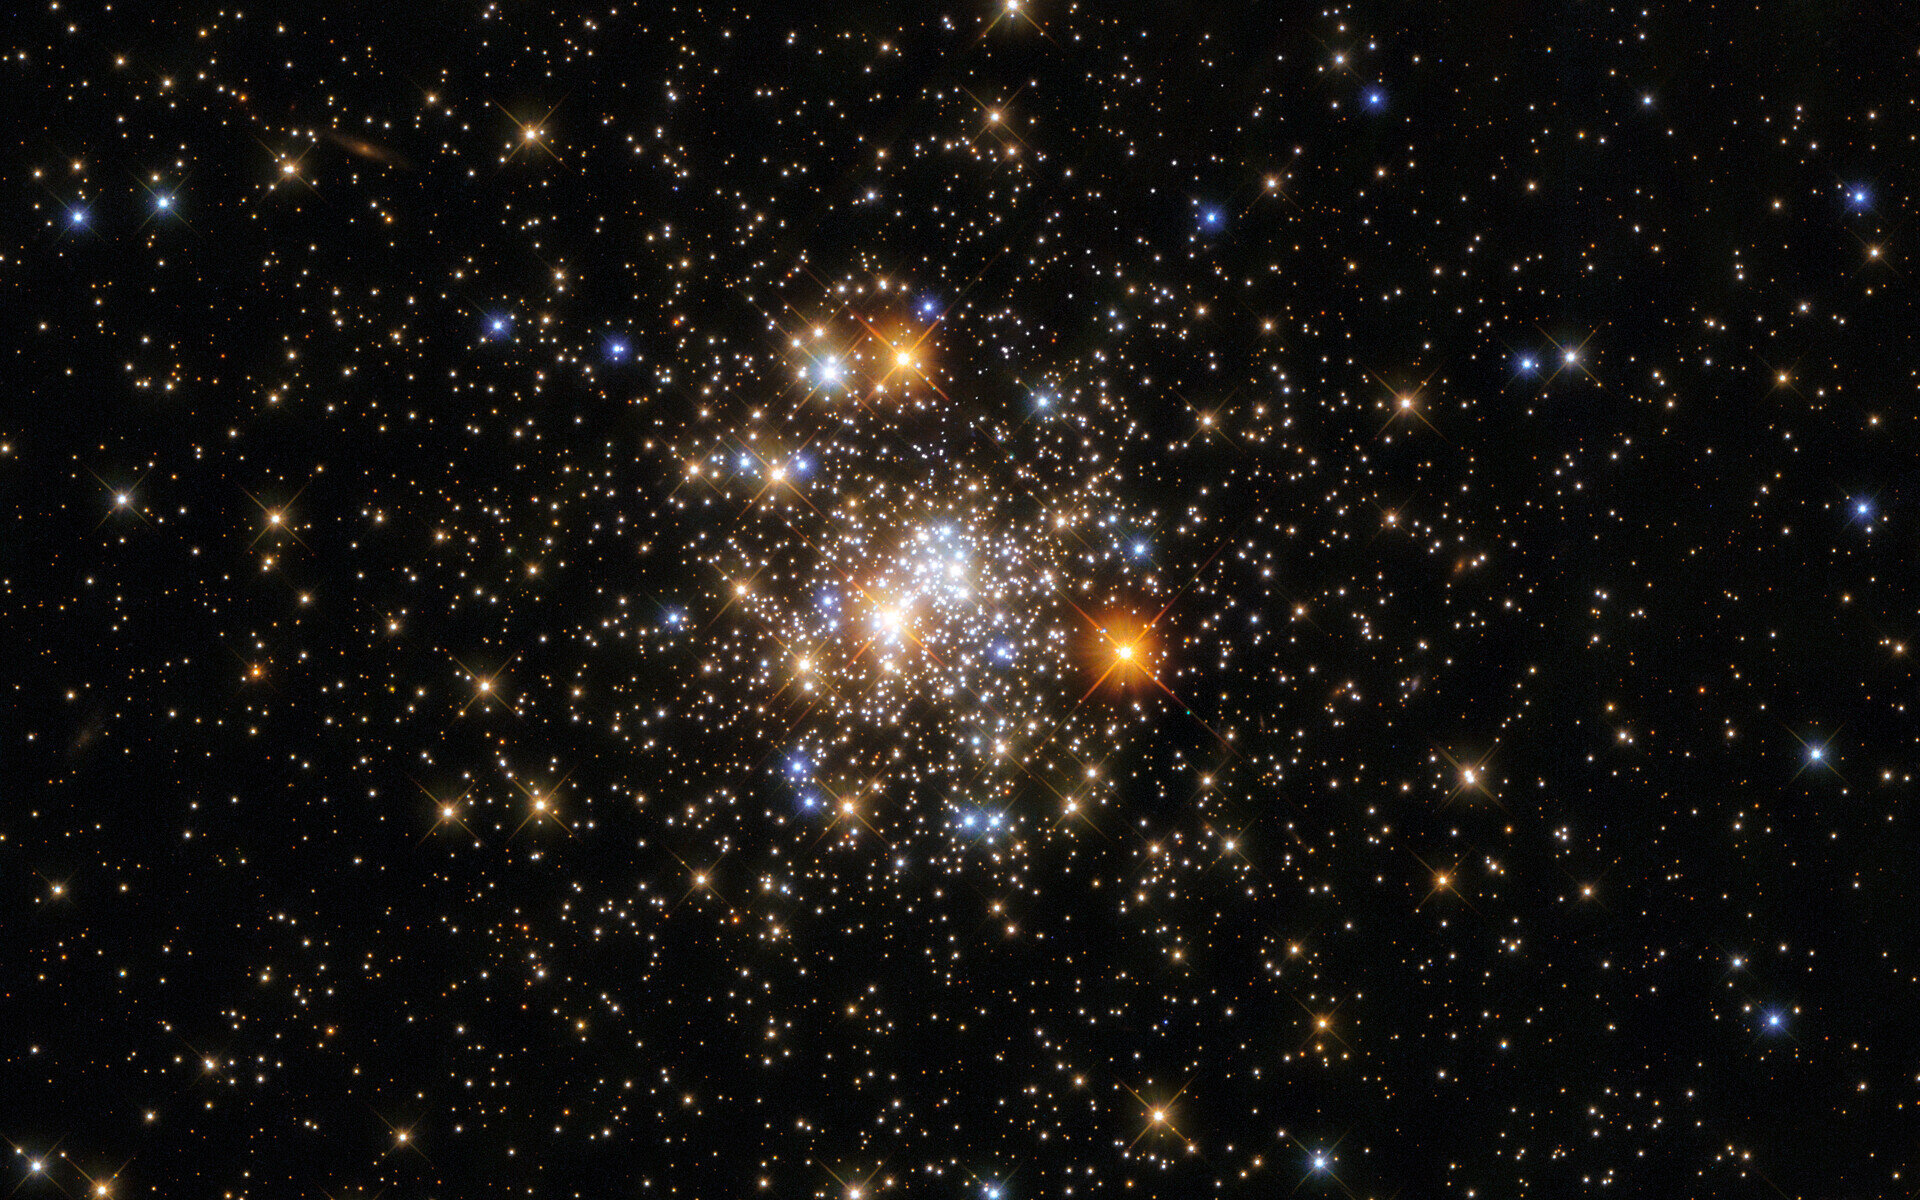 Image: Hubble captures a sparkling cluster